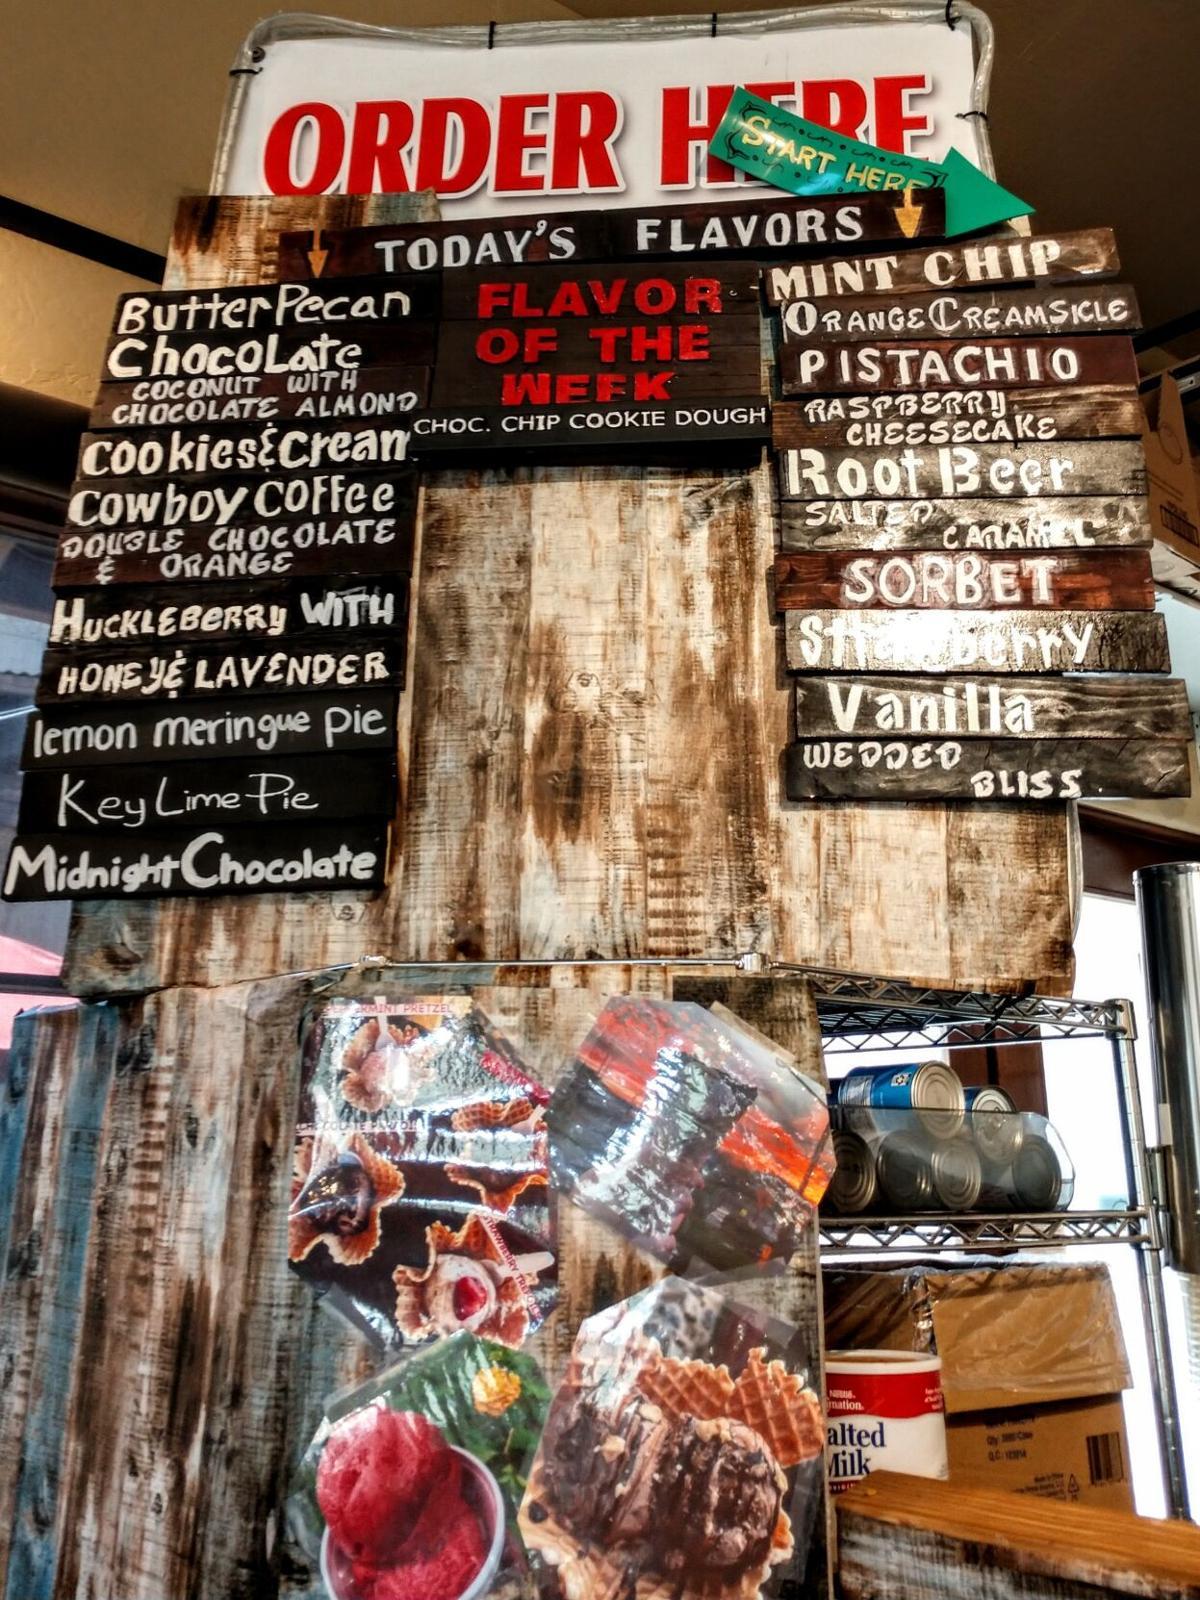 The City Creamery daily menu